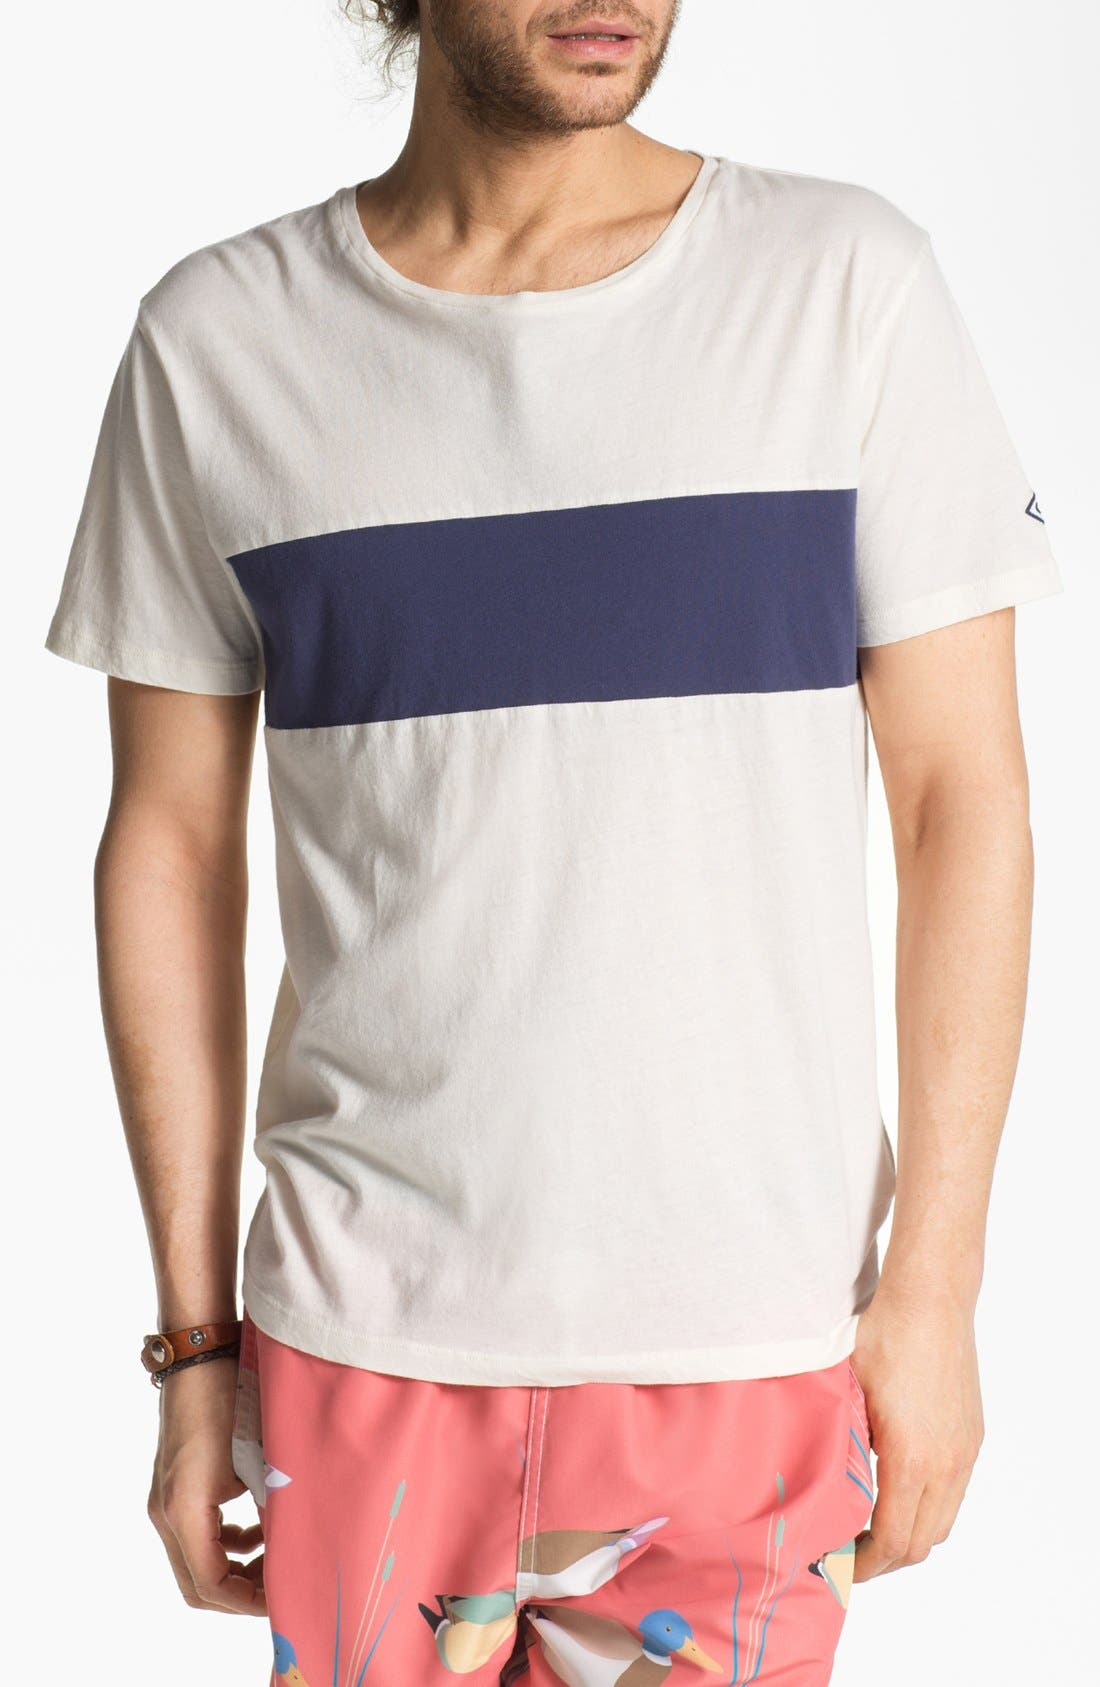 Alternate Image 1 Selected - Gant Rugger 'Cut & Sewn' T-Shirt